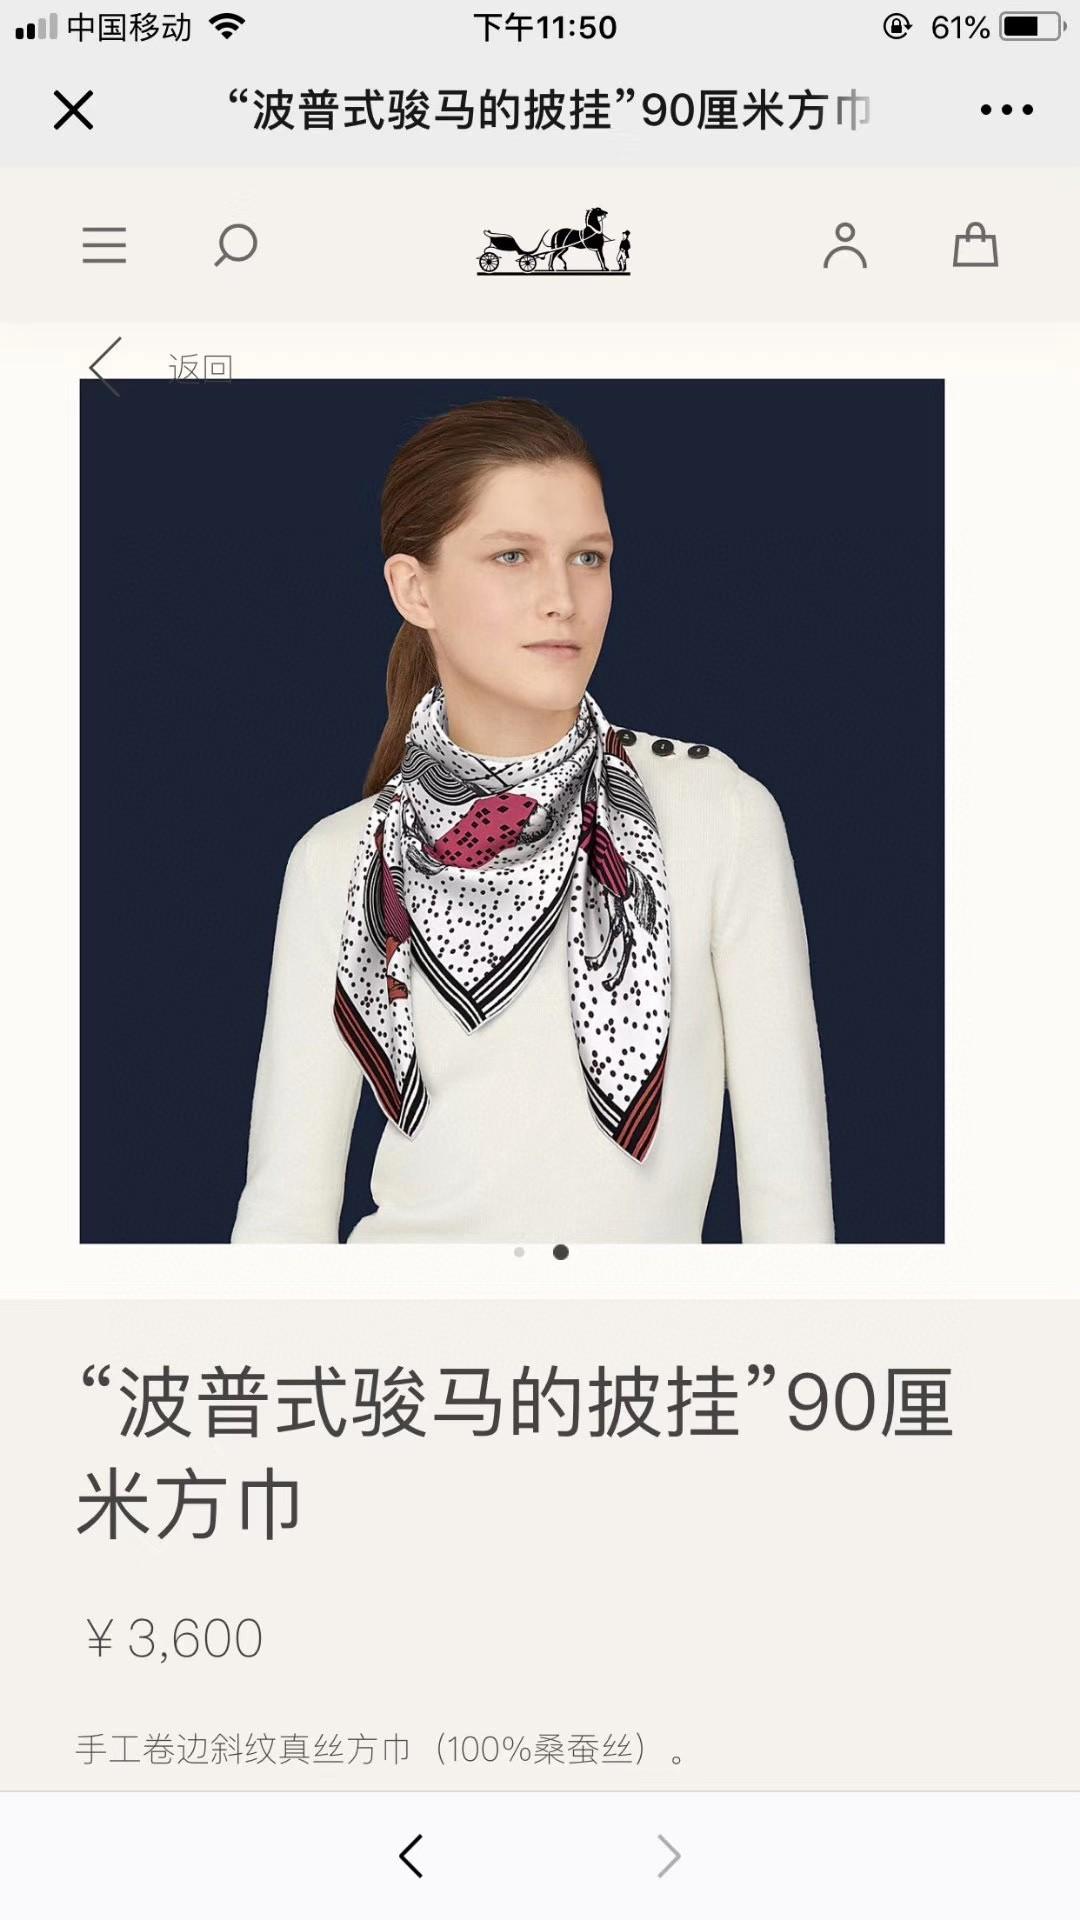 HERMES 《 波普式骏马的披挂》丝巾 白色 Size:90x90cm 100%真丝